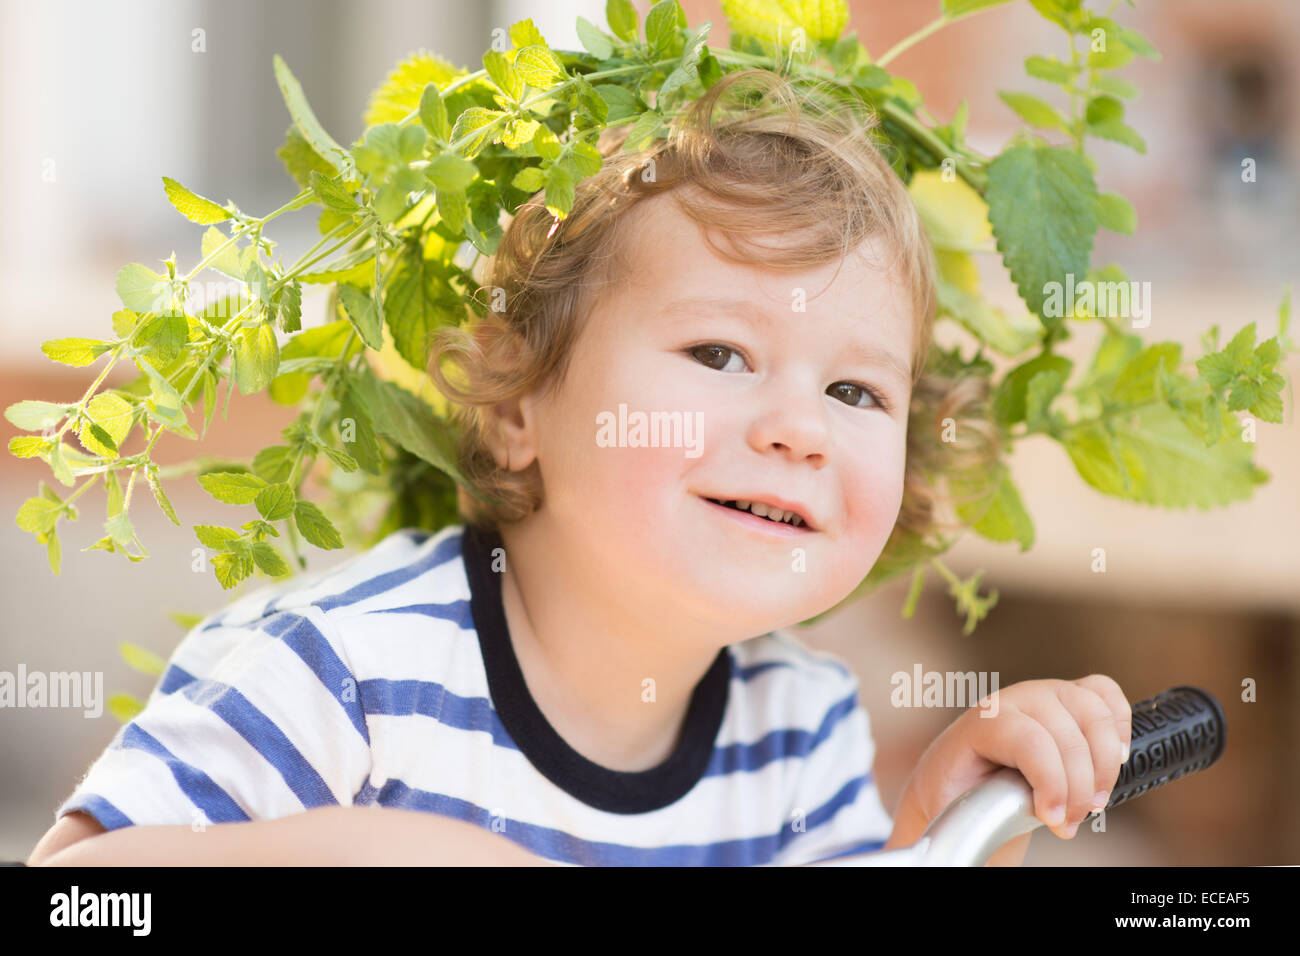 USA, South Carolina, Greenville County, Greenville, Porträt des jungen (2-3) tragen Kranz Stockbild